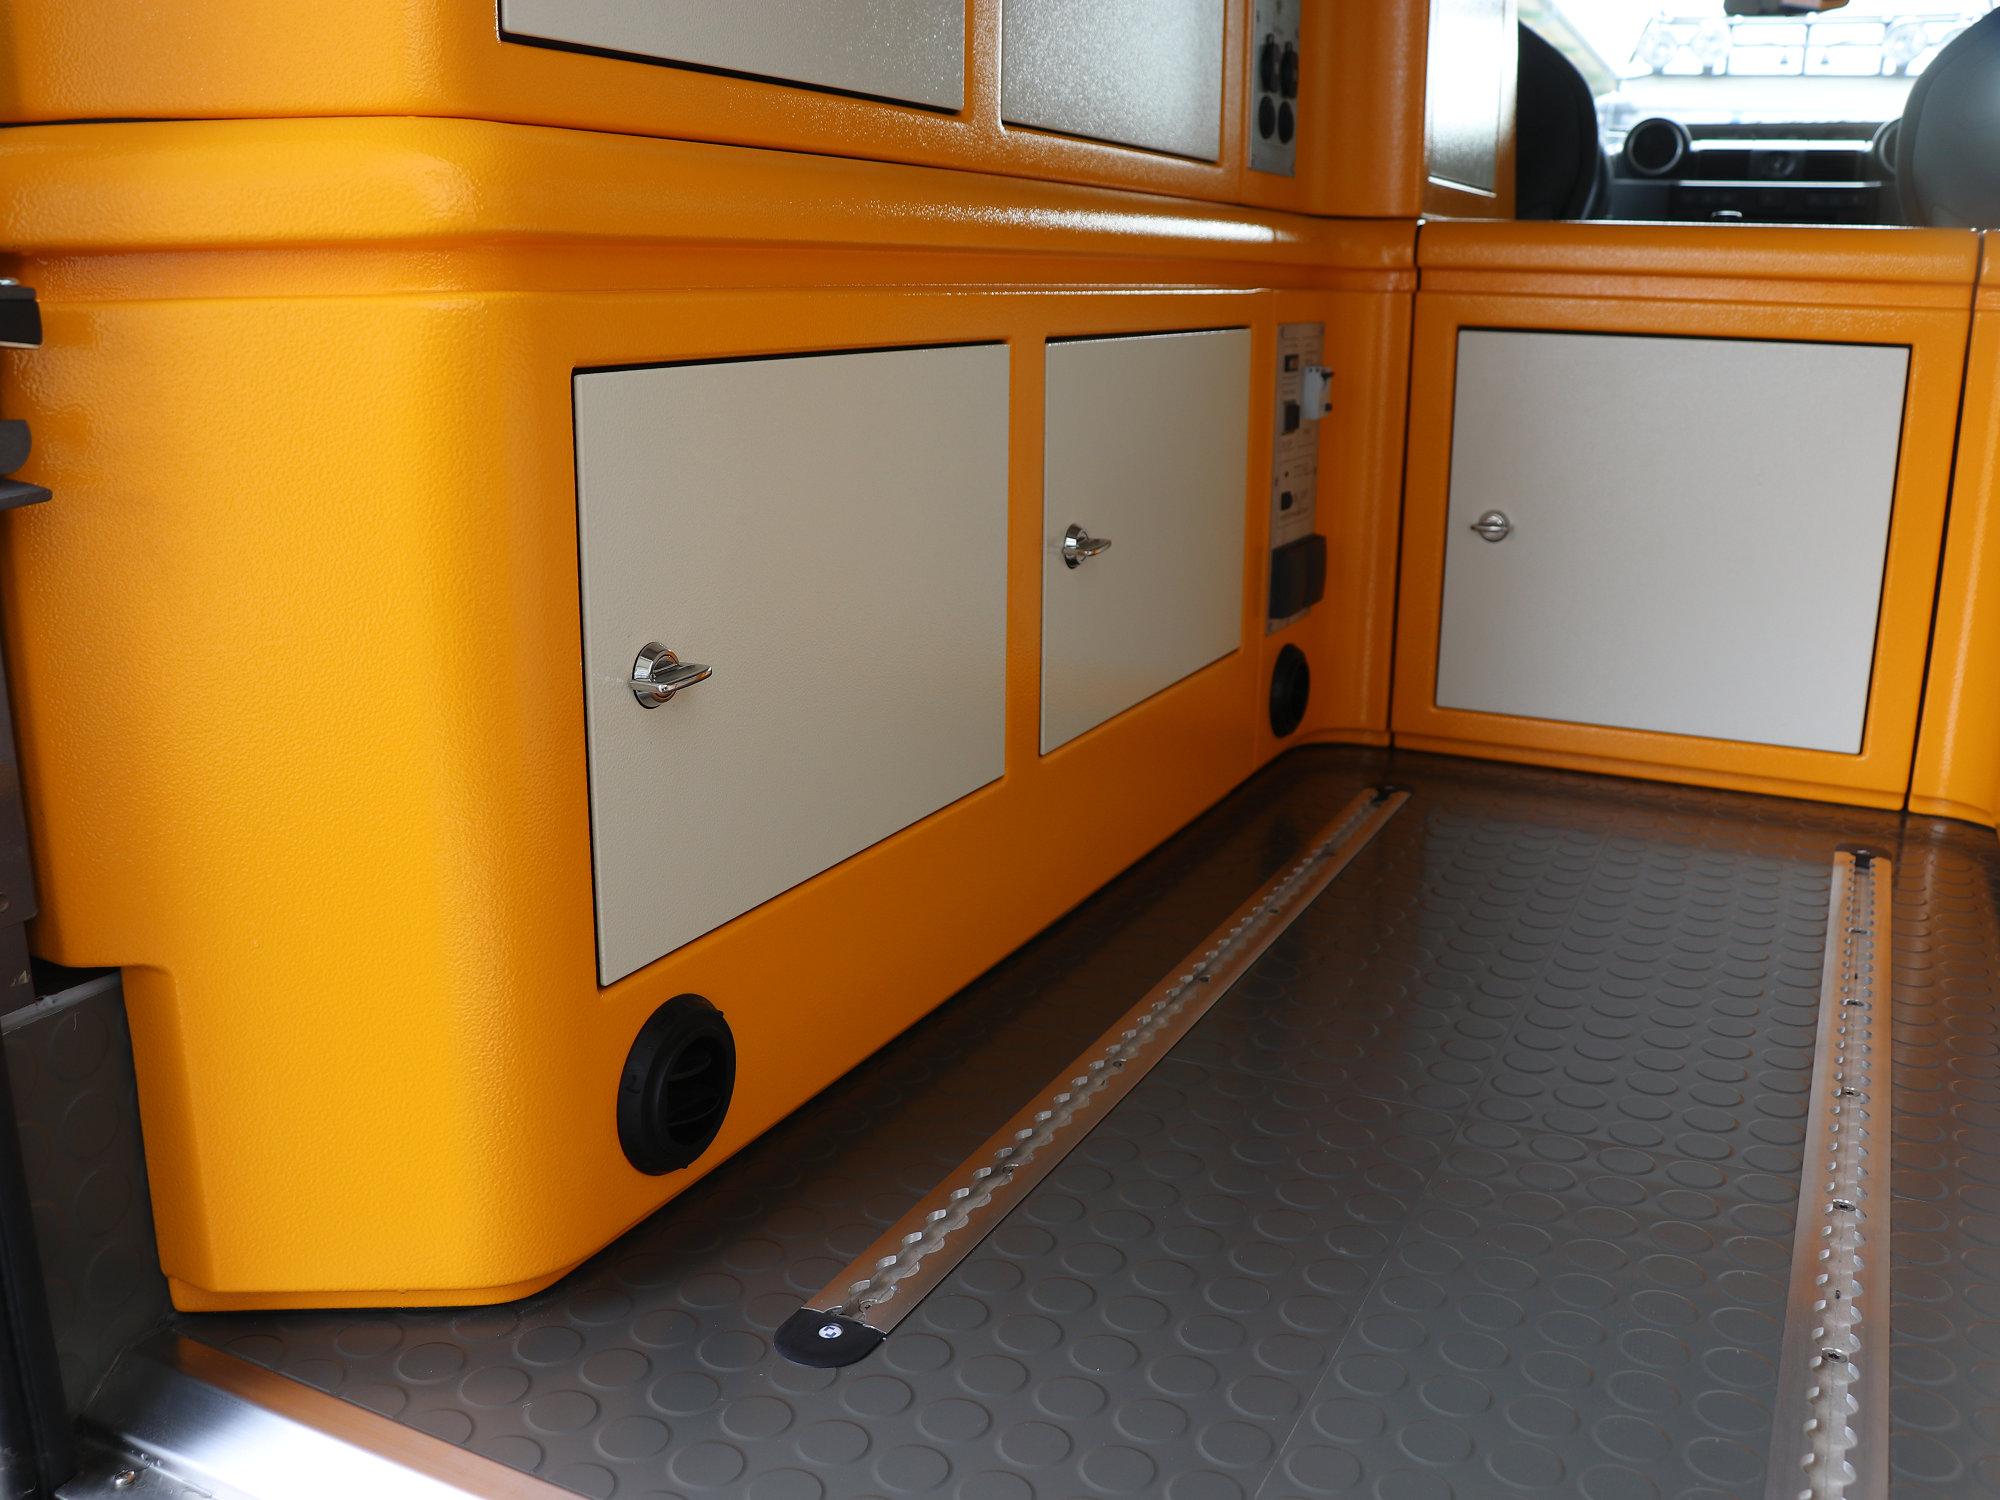 Sitzbox Fahrer Land Rover Defender.003